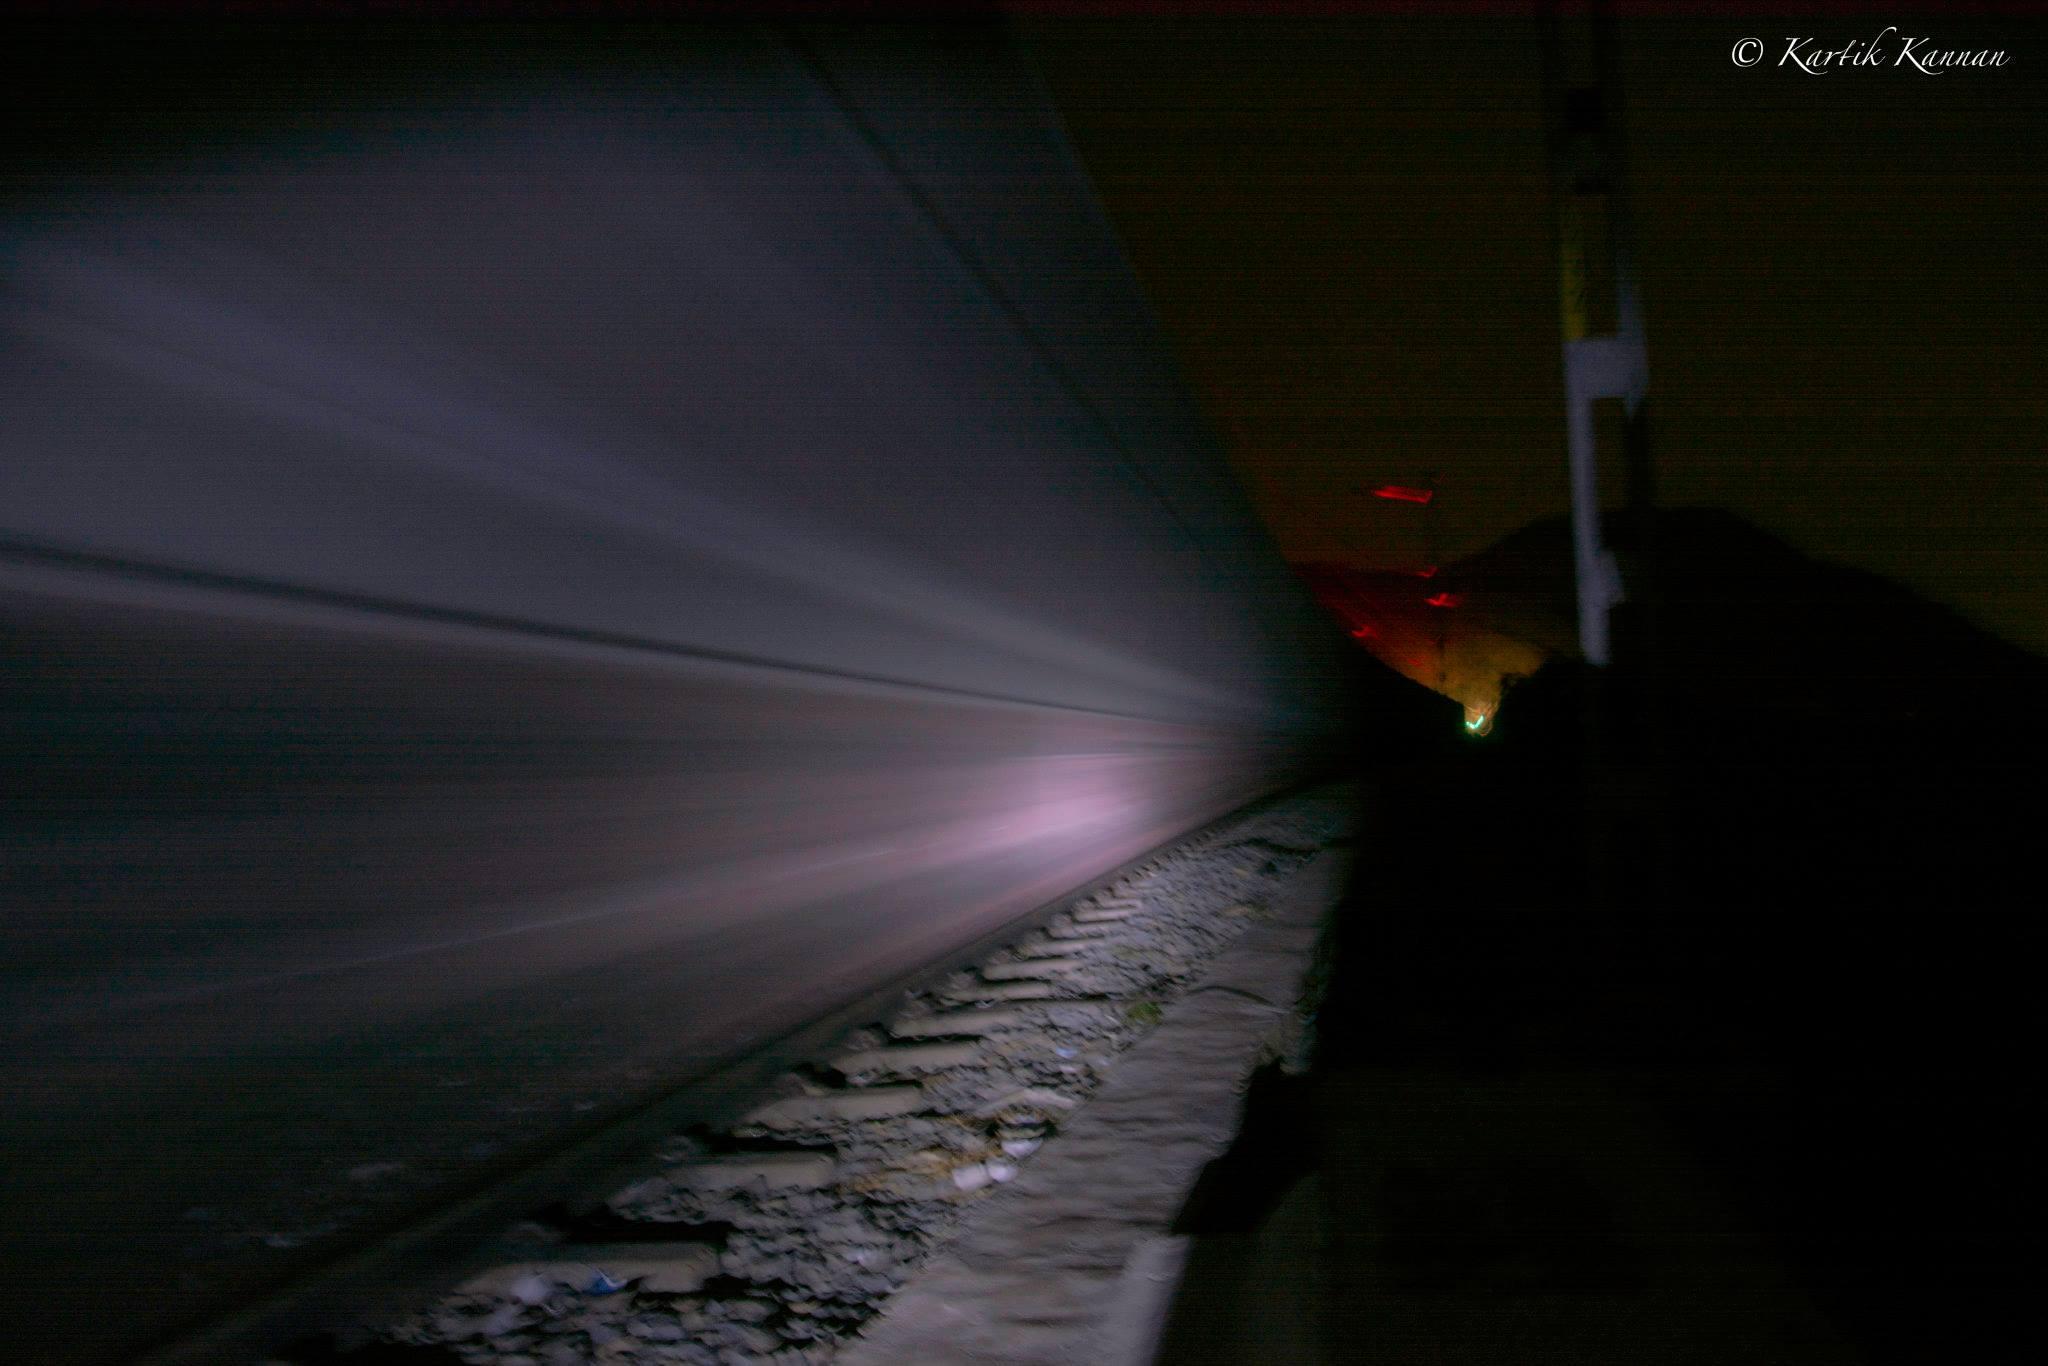 Railtrek to Makalidurga